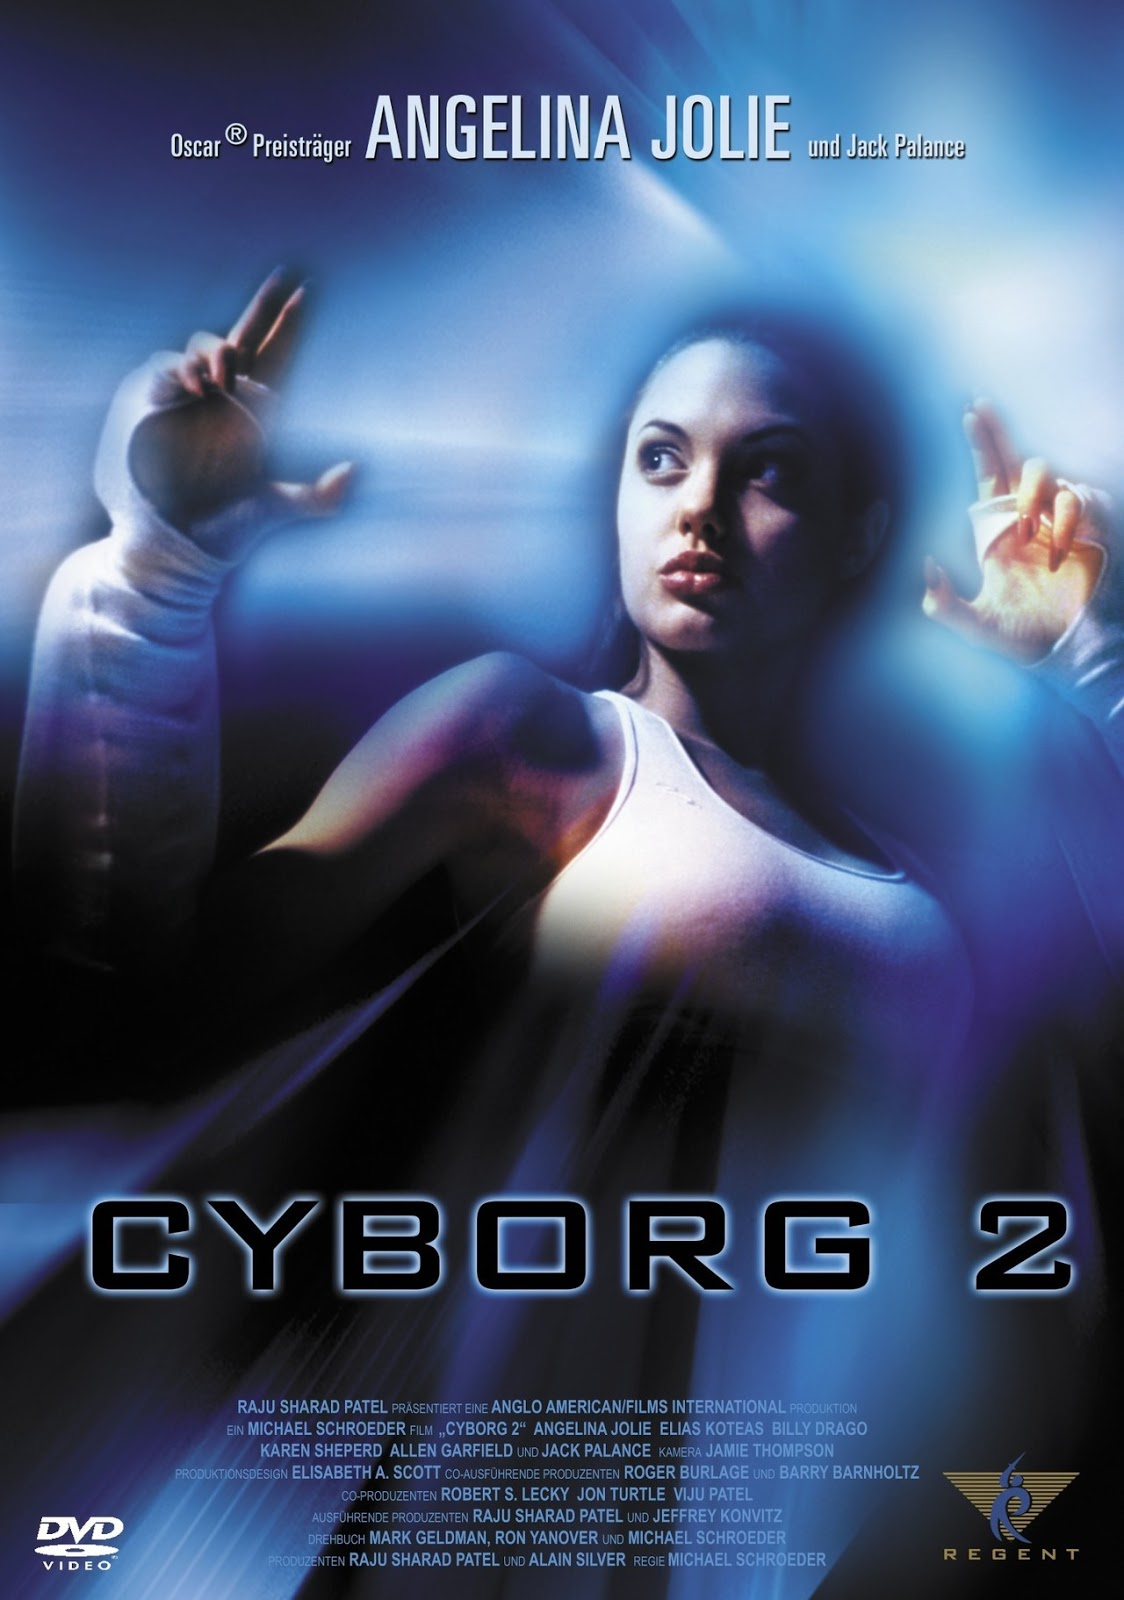 Angelina Jolie Cyborg 2 1993 comeuppance reviews: cyborg 2: glass shadow (1993)